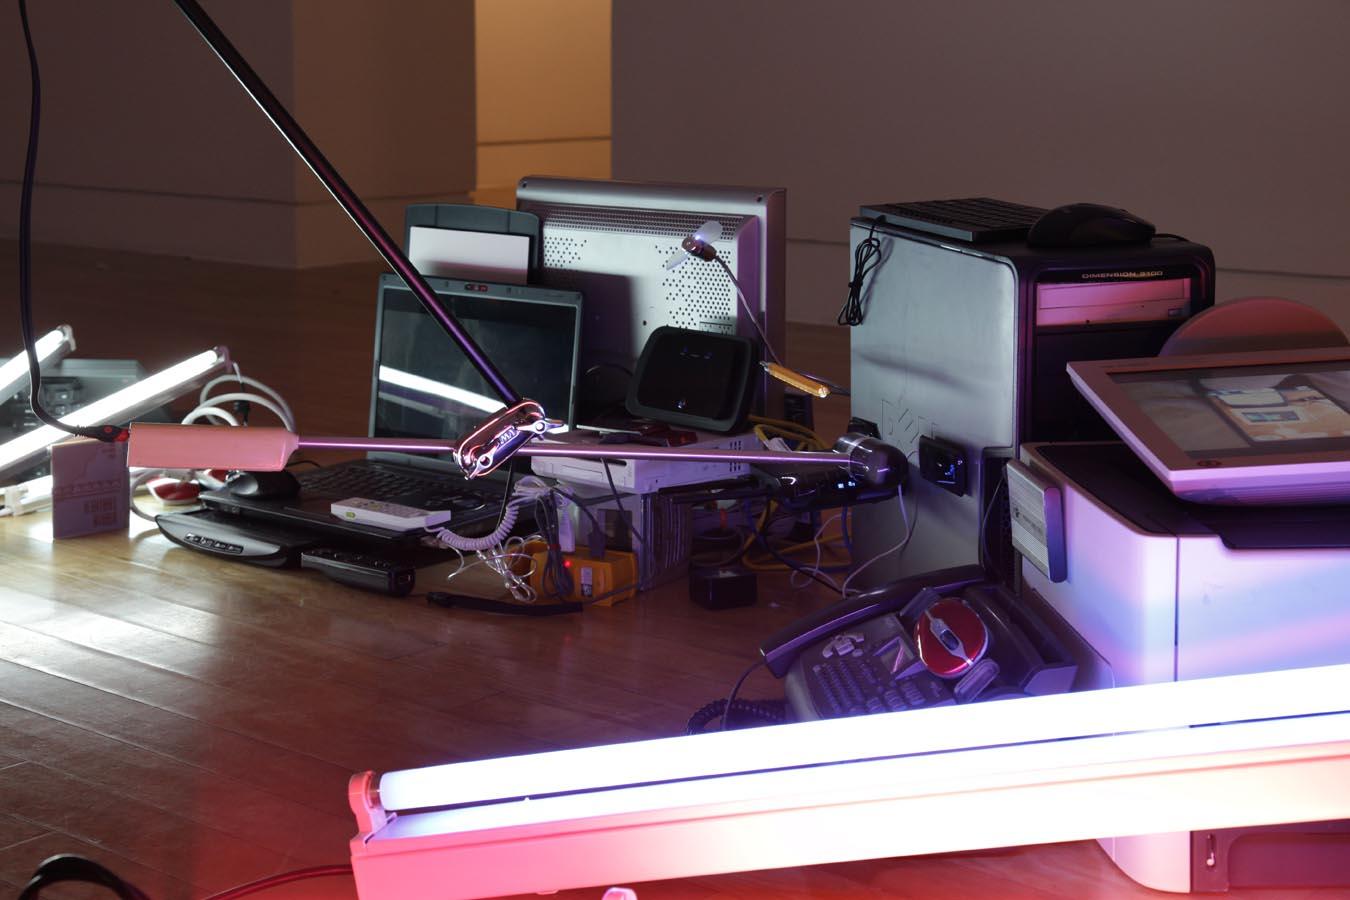 'Electroprobe Installation #5', 2014 | Troika (Eva Rucki, Sebastien Noel, Conny Freyer)